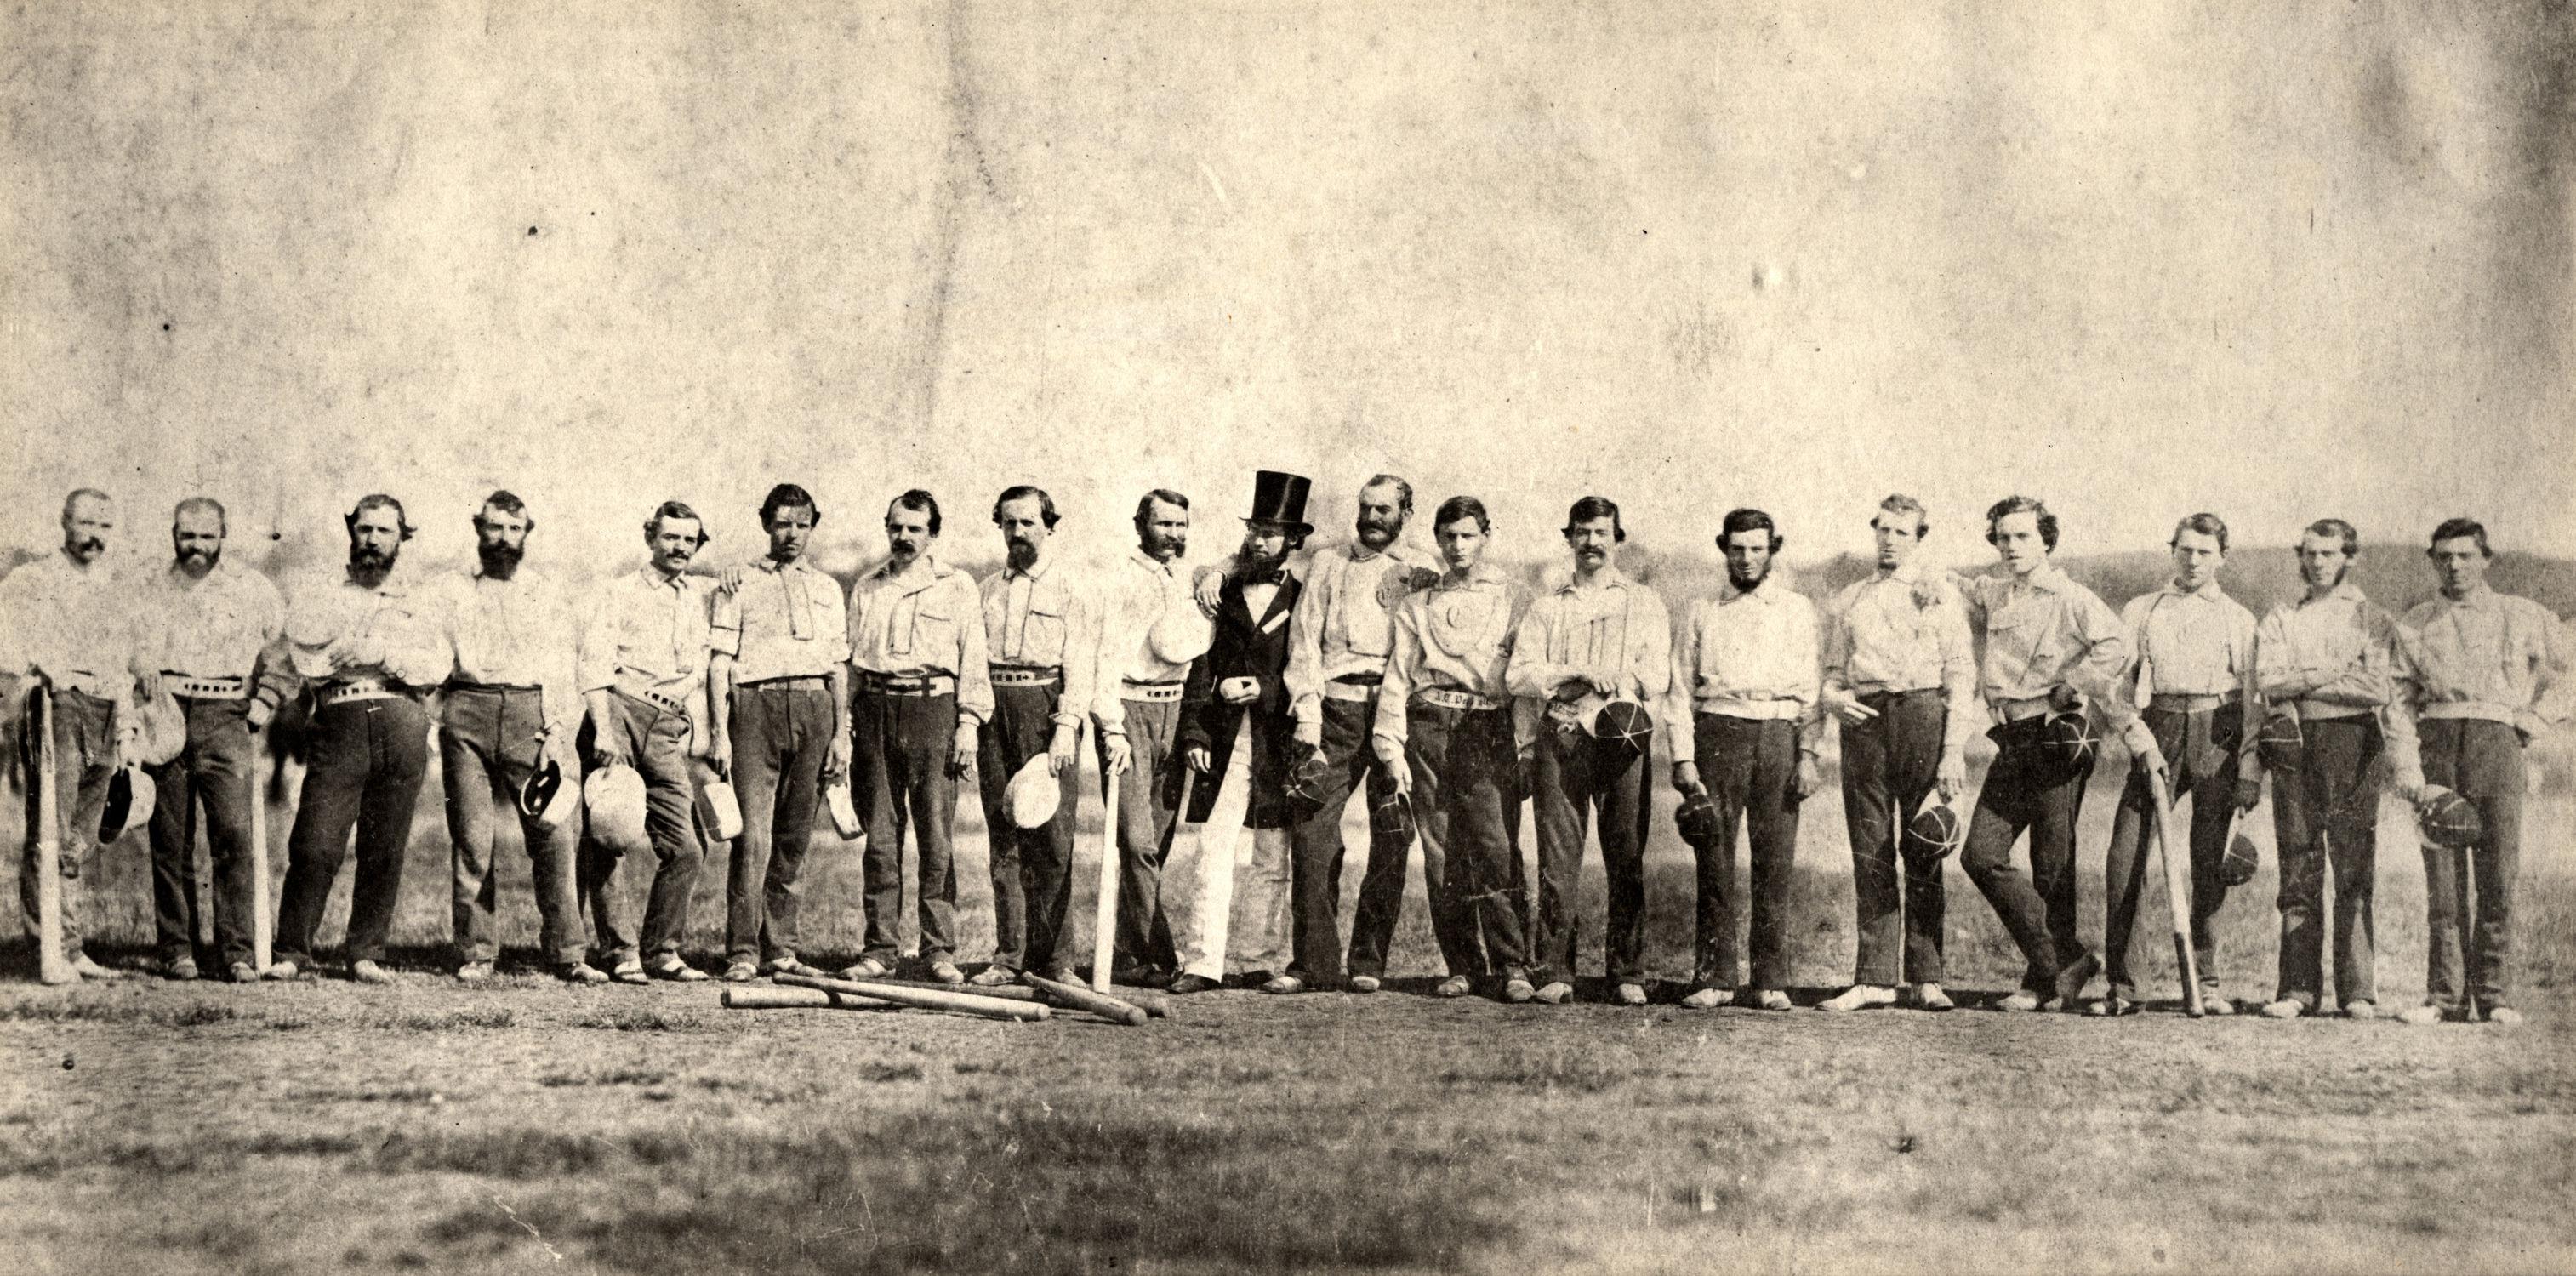 Knickerbocker Base ball Club